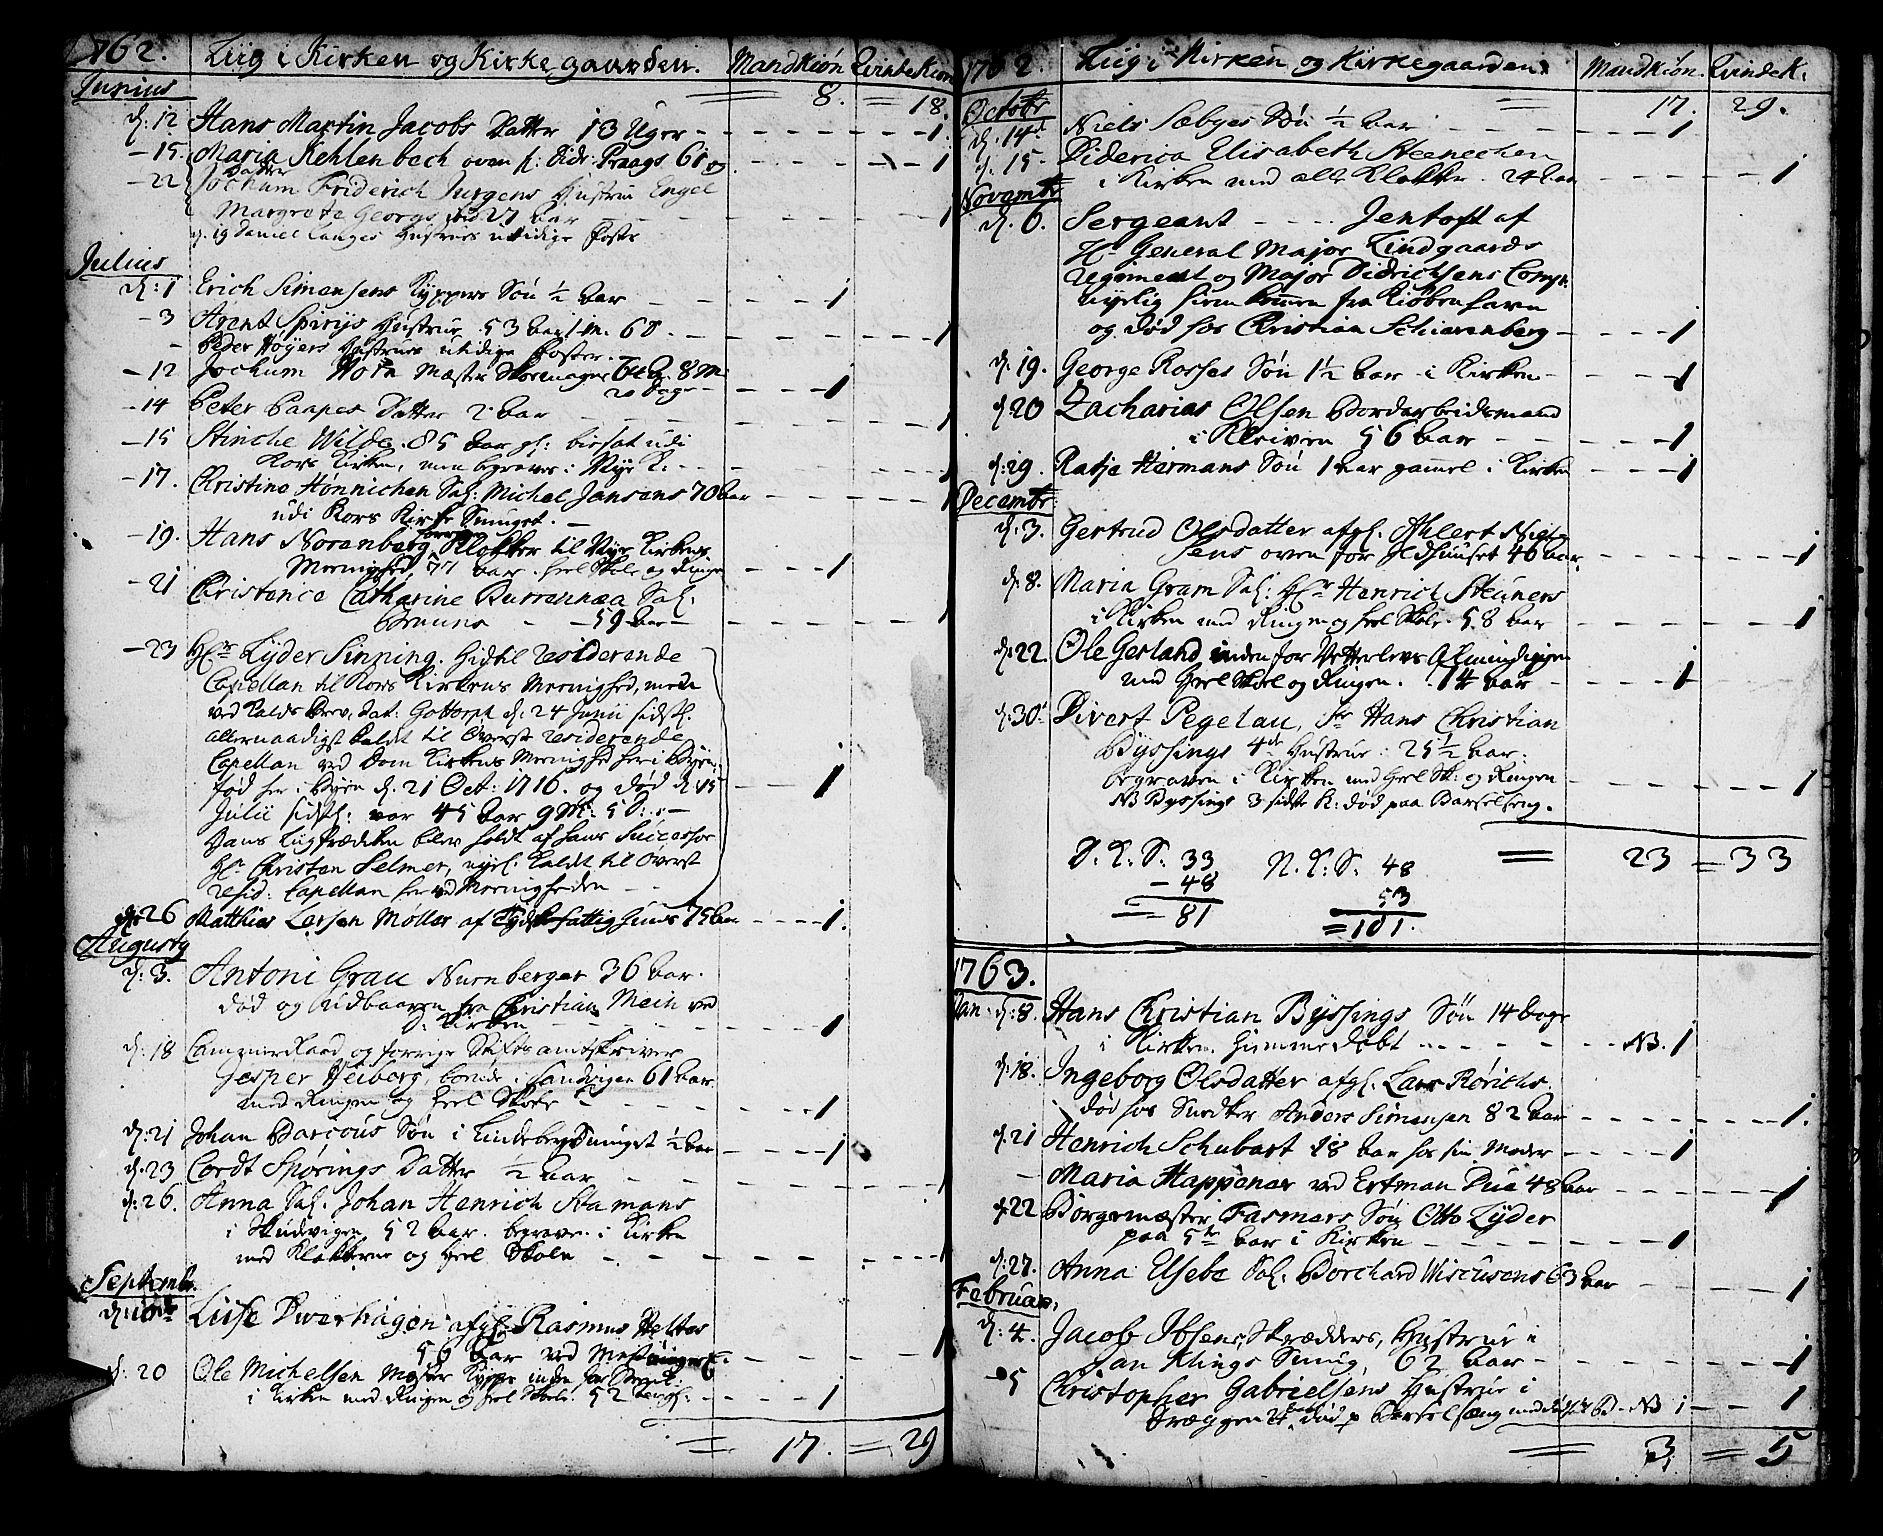 SAB, Korskirken Sokneprestembete, H/Haa/L0011: Ministerialbok nr. A 11, 1731-1785, s. 159